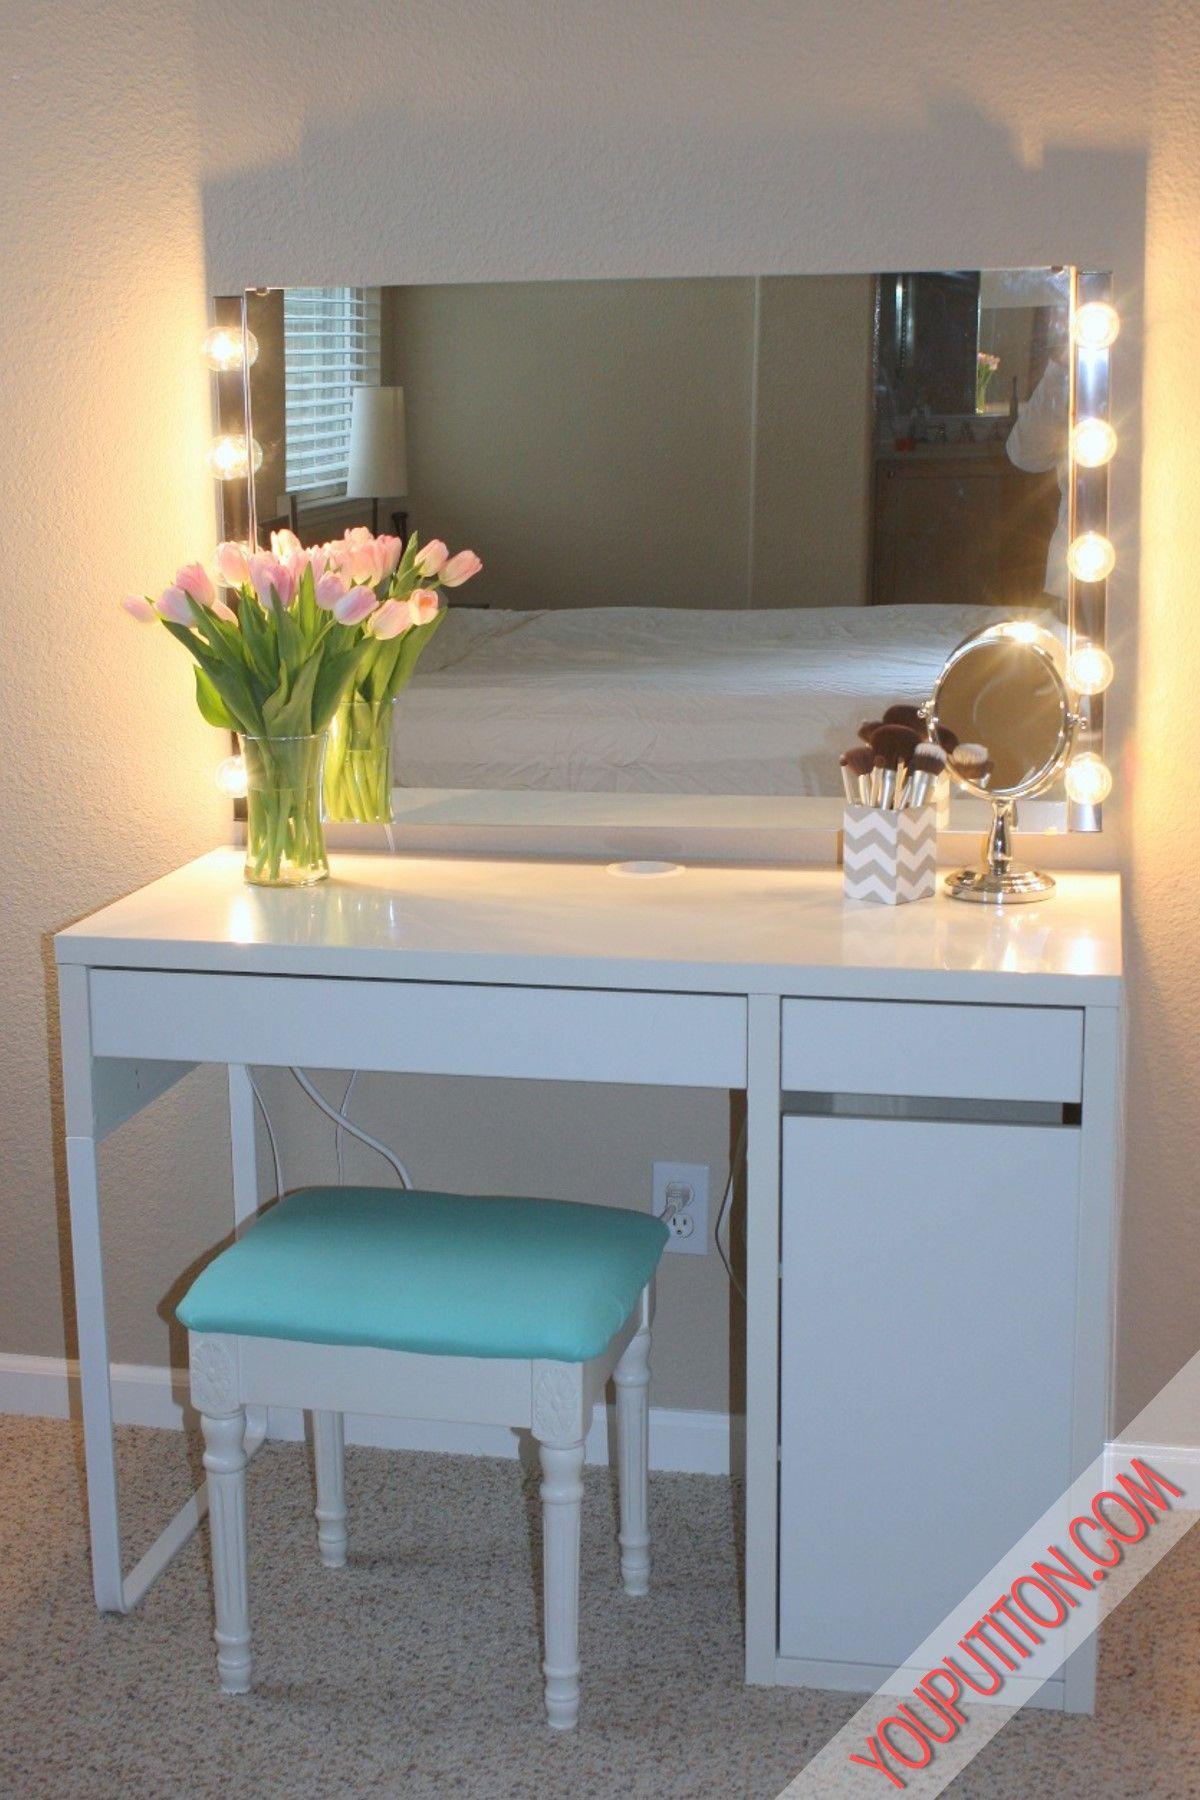 Finished Vanity Diy Vanity Mirror Home Decor Diy Vanity